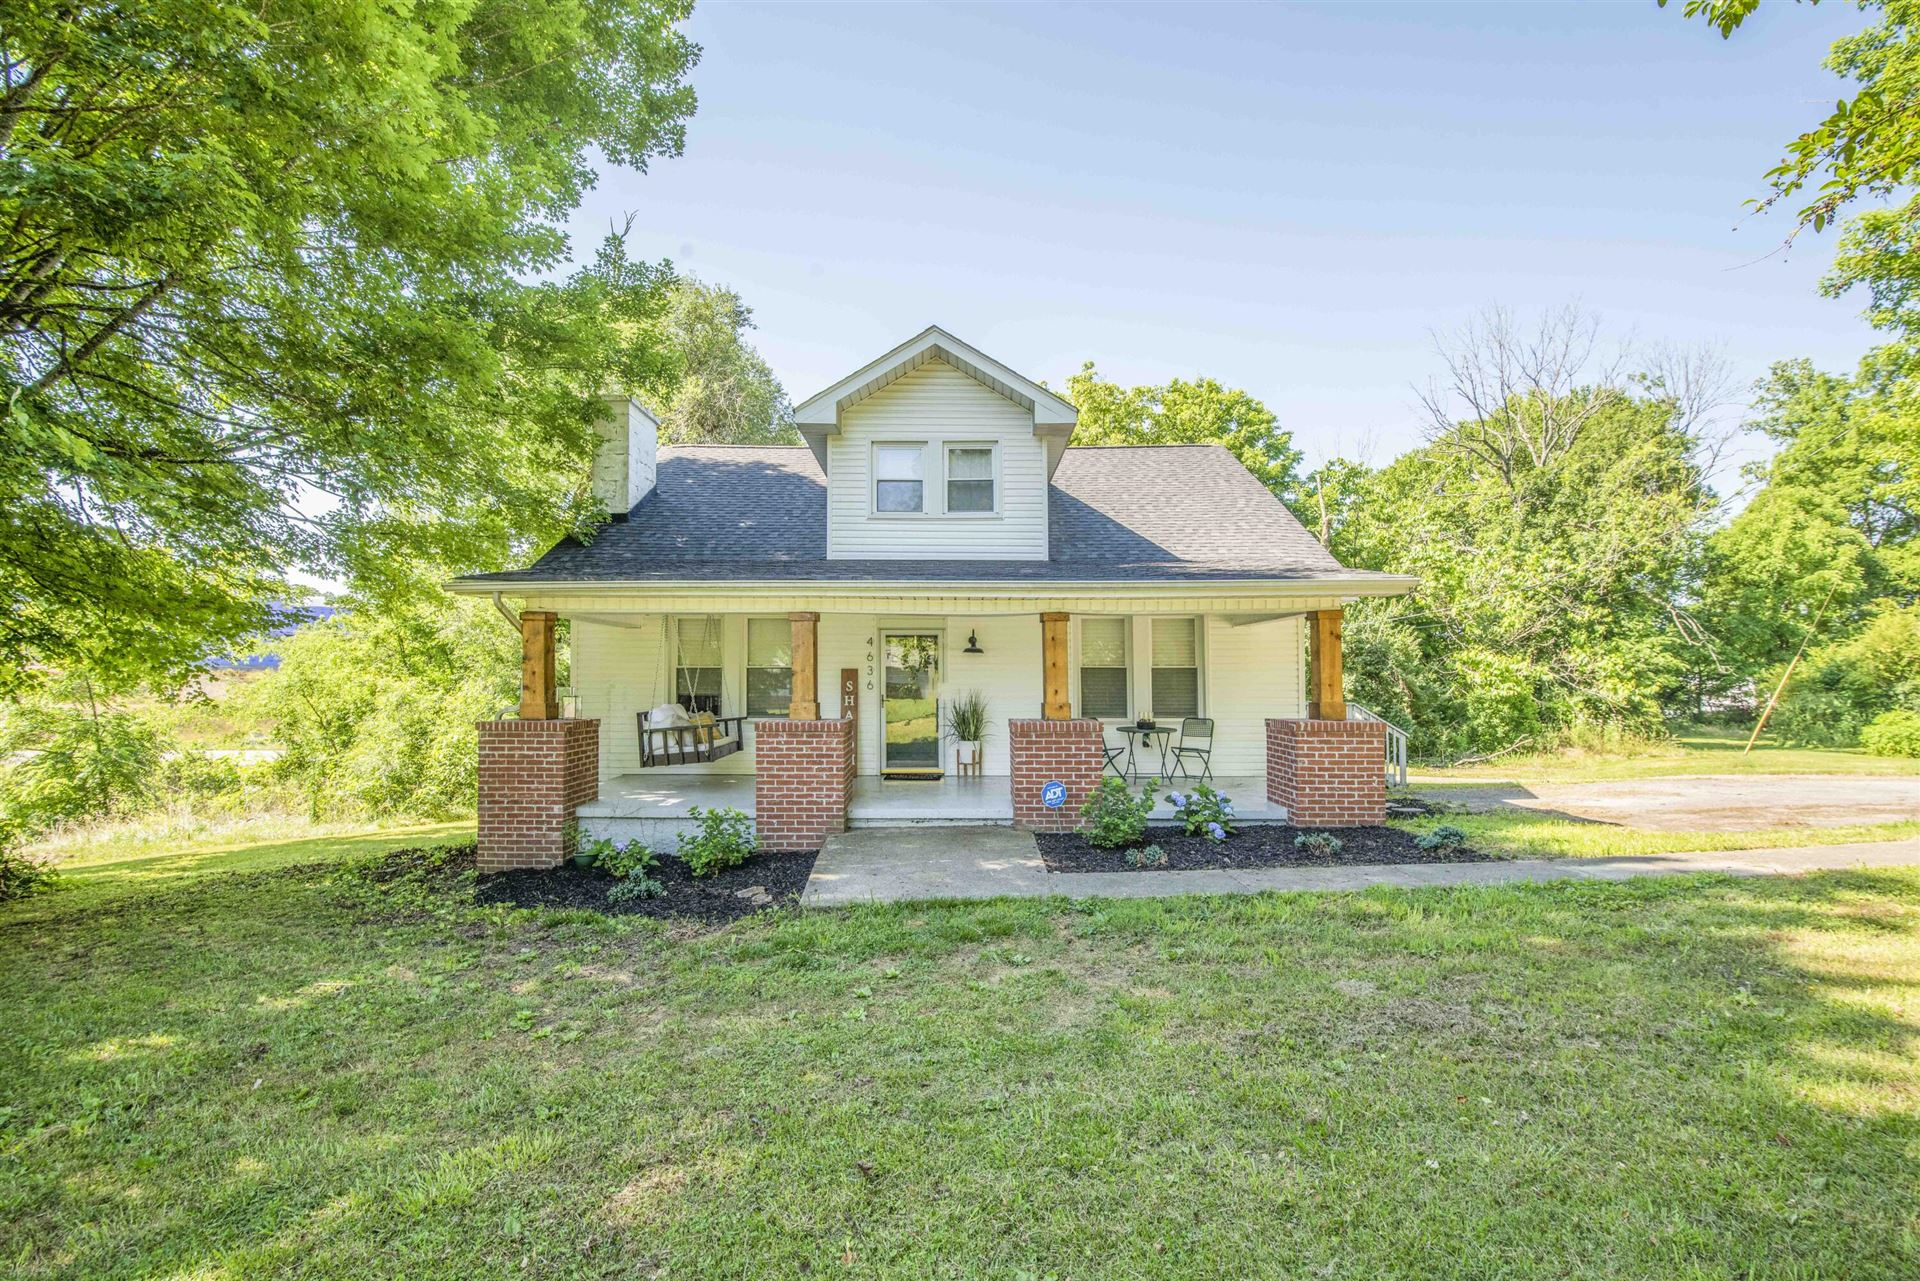 4636 Beaver Ridge Rd, Knoxville, TN 37931 - MLS#: 1159583